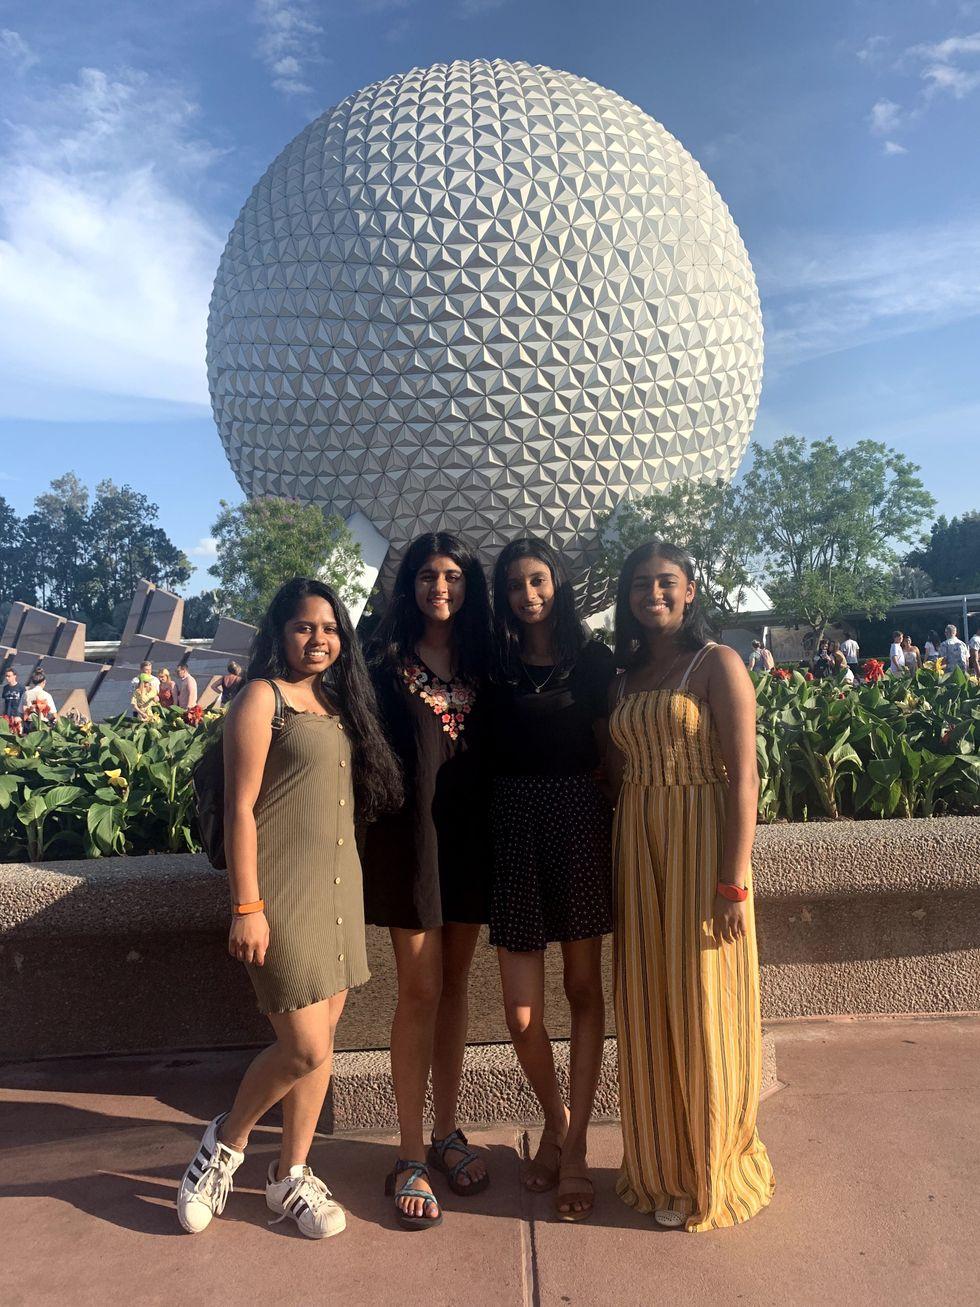 Photo Album: A Week In Disney Orlando For HOSA ILC With Friends